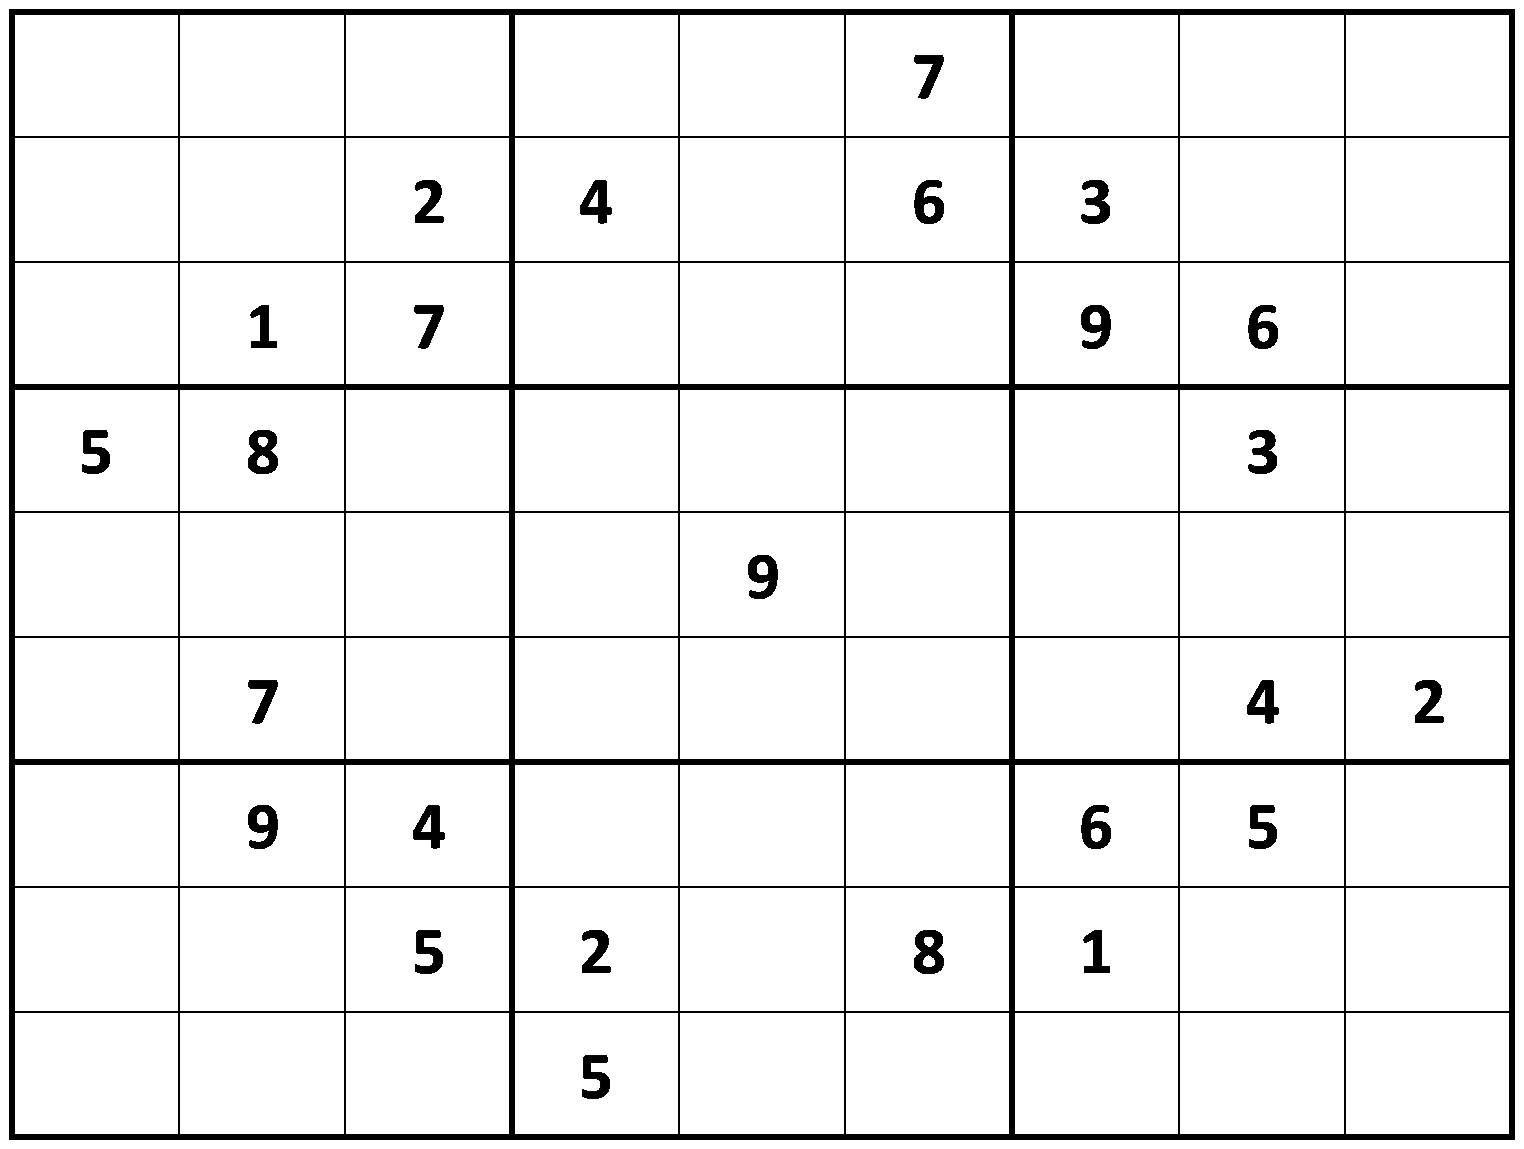 Printable - Difficult Sudoku Puzzles | Sudoku Puzzles, Sudoku